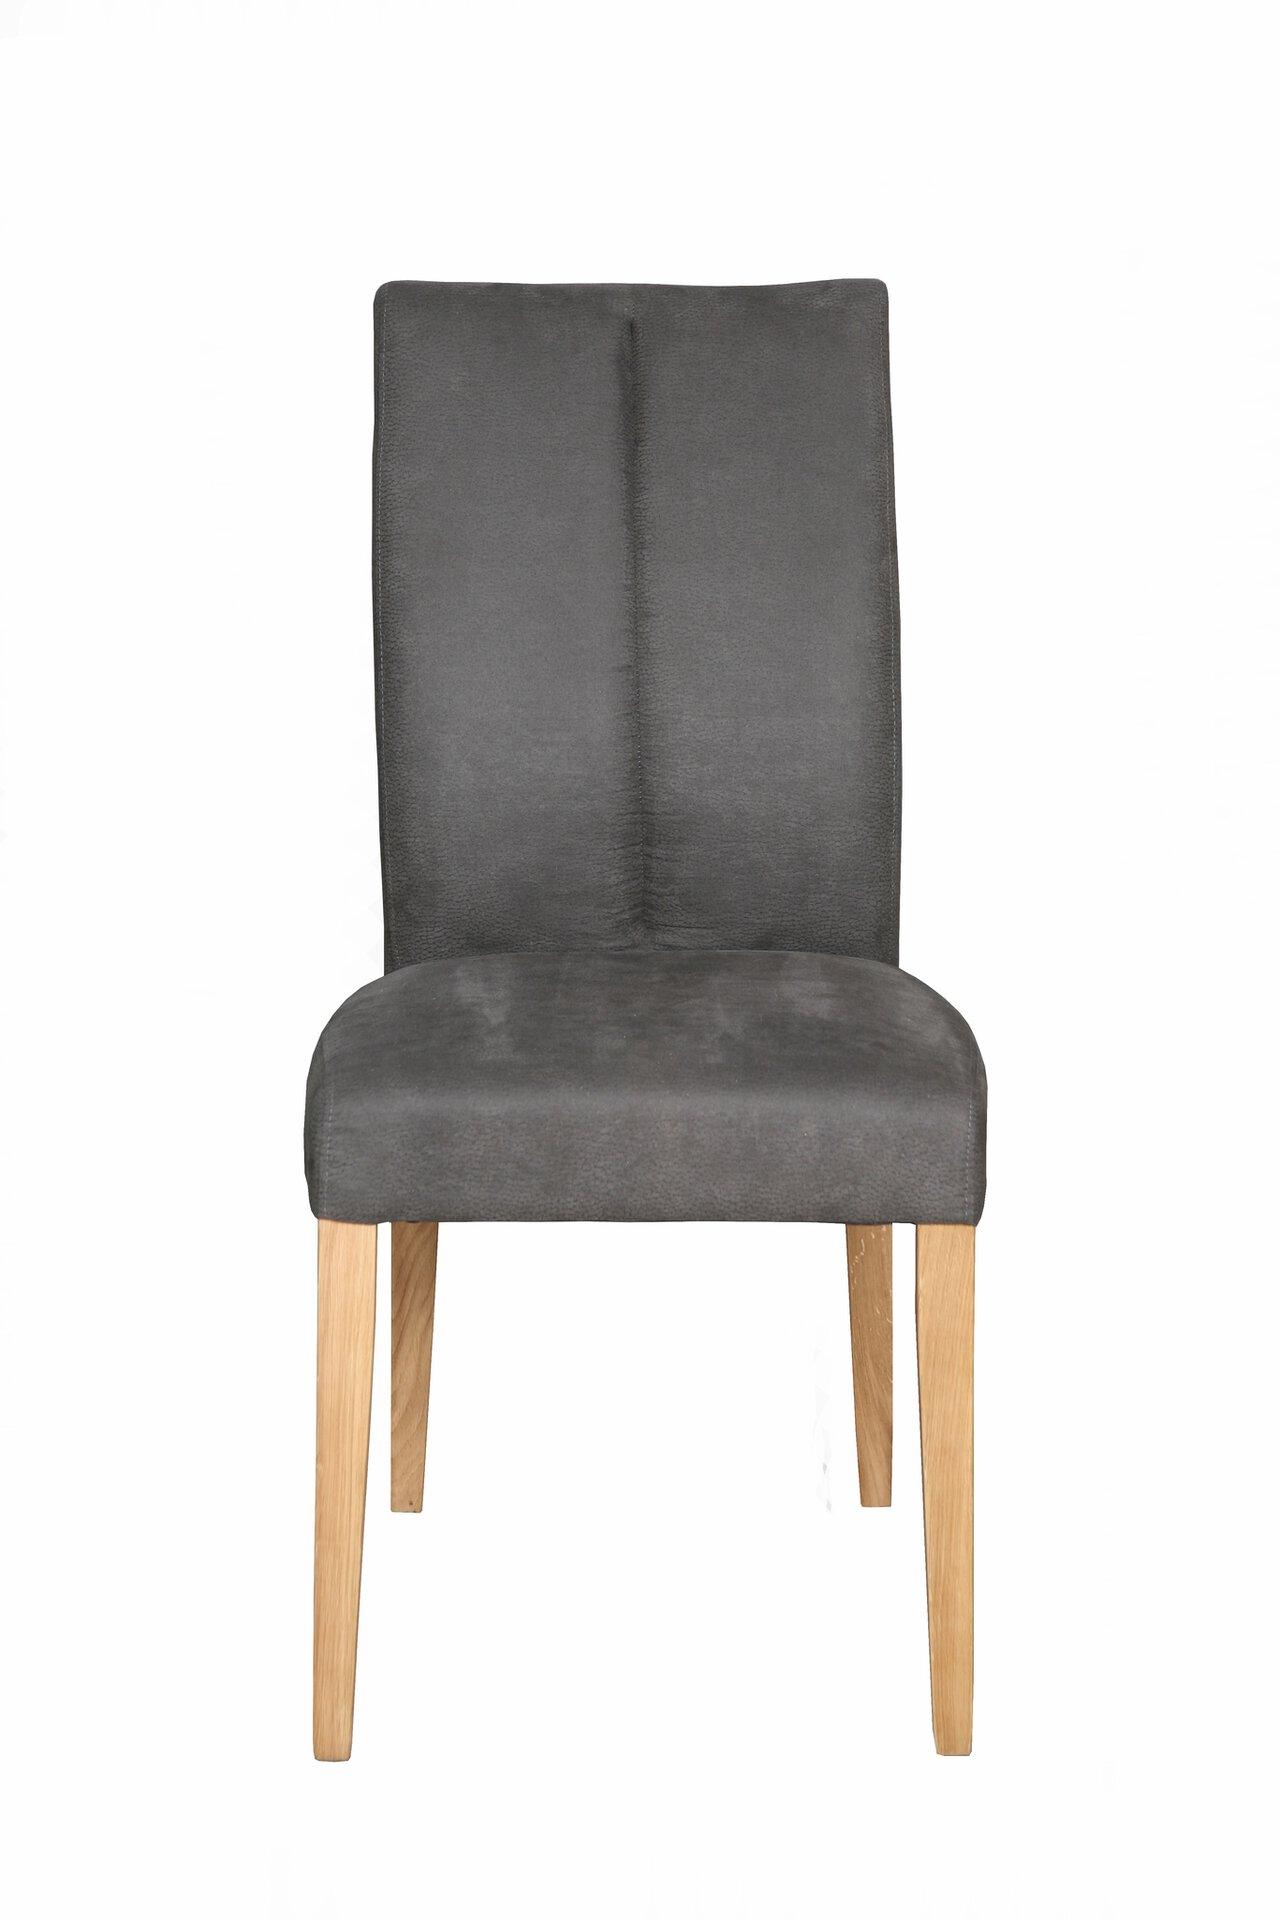 Stuhl TRICKY Vito Textil mehrfarbig 66 x 97 x 48 cm